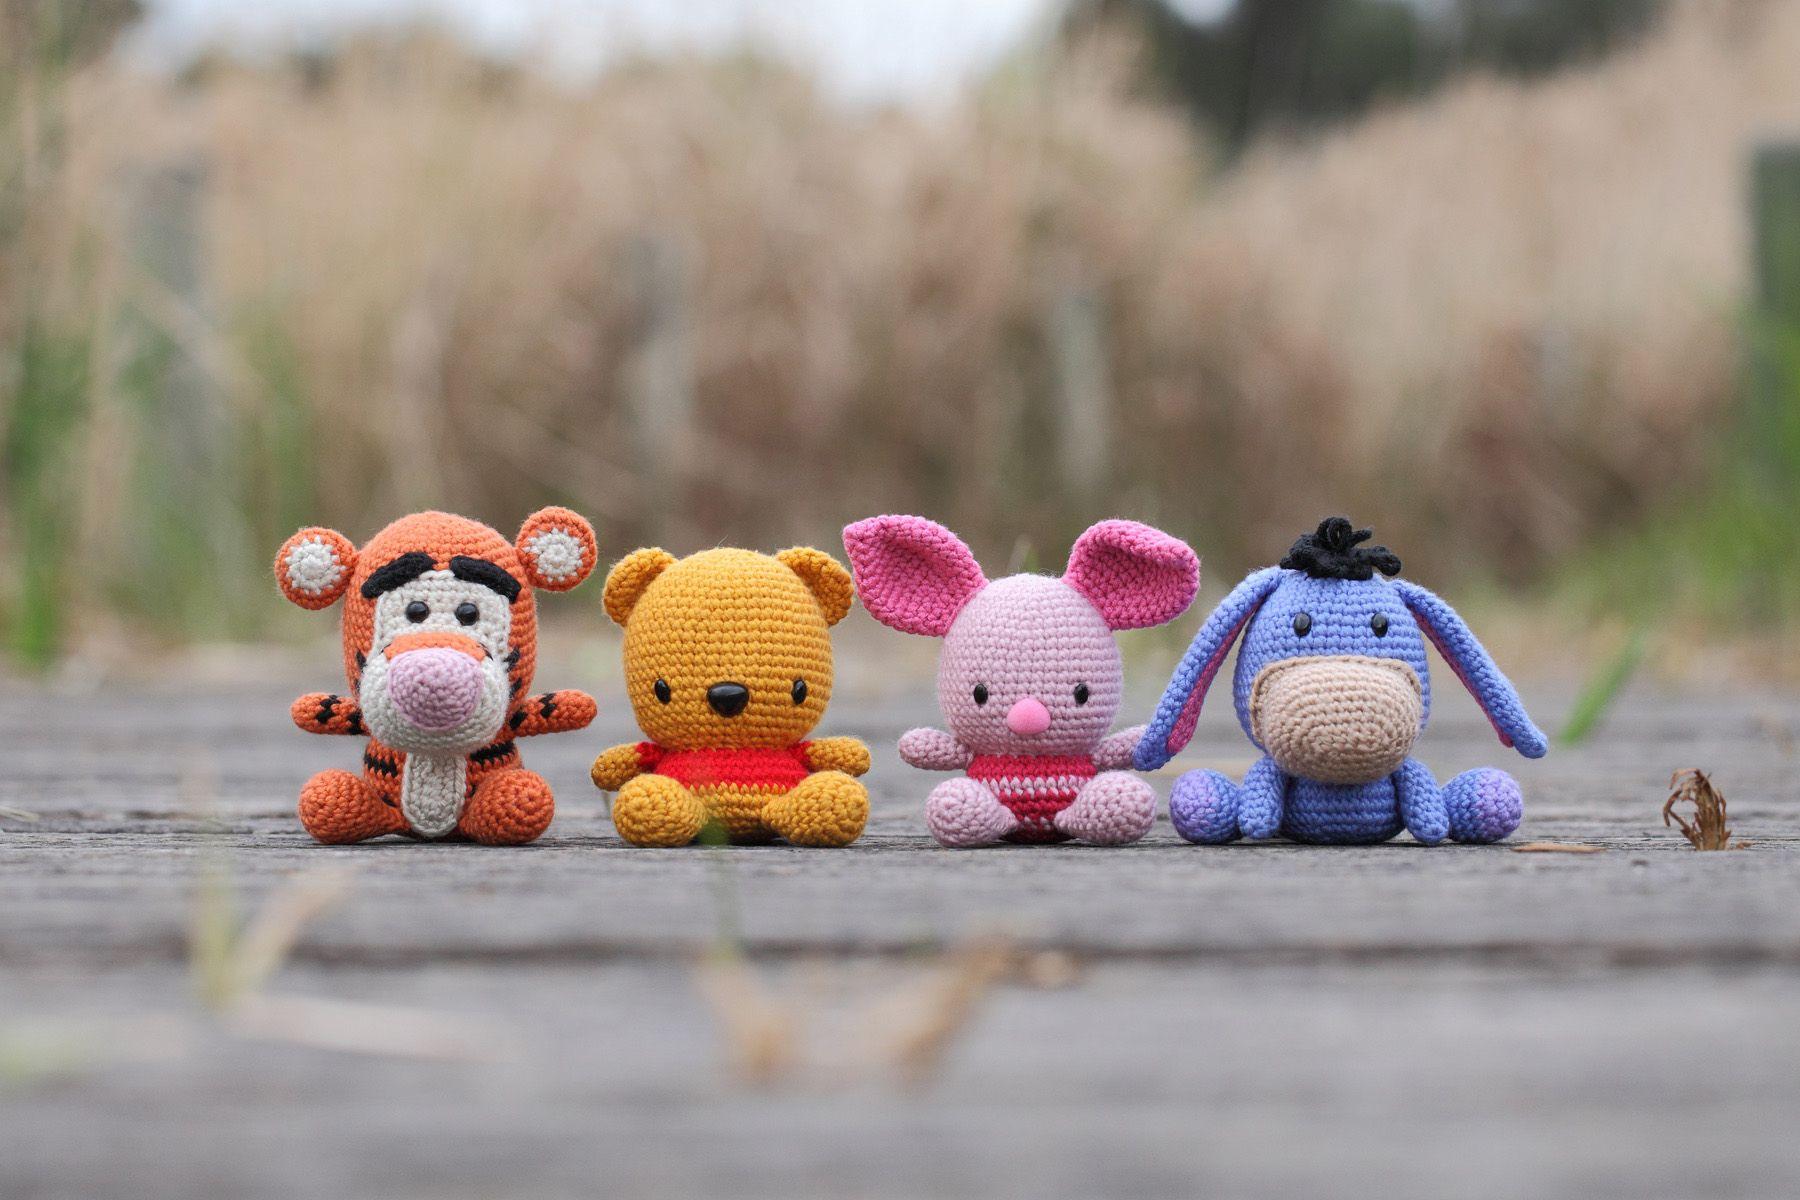 Winnie the Pooh and Friends | Amigurumis! | Pinterest | Patrones ...